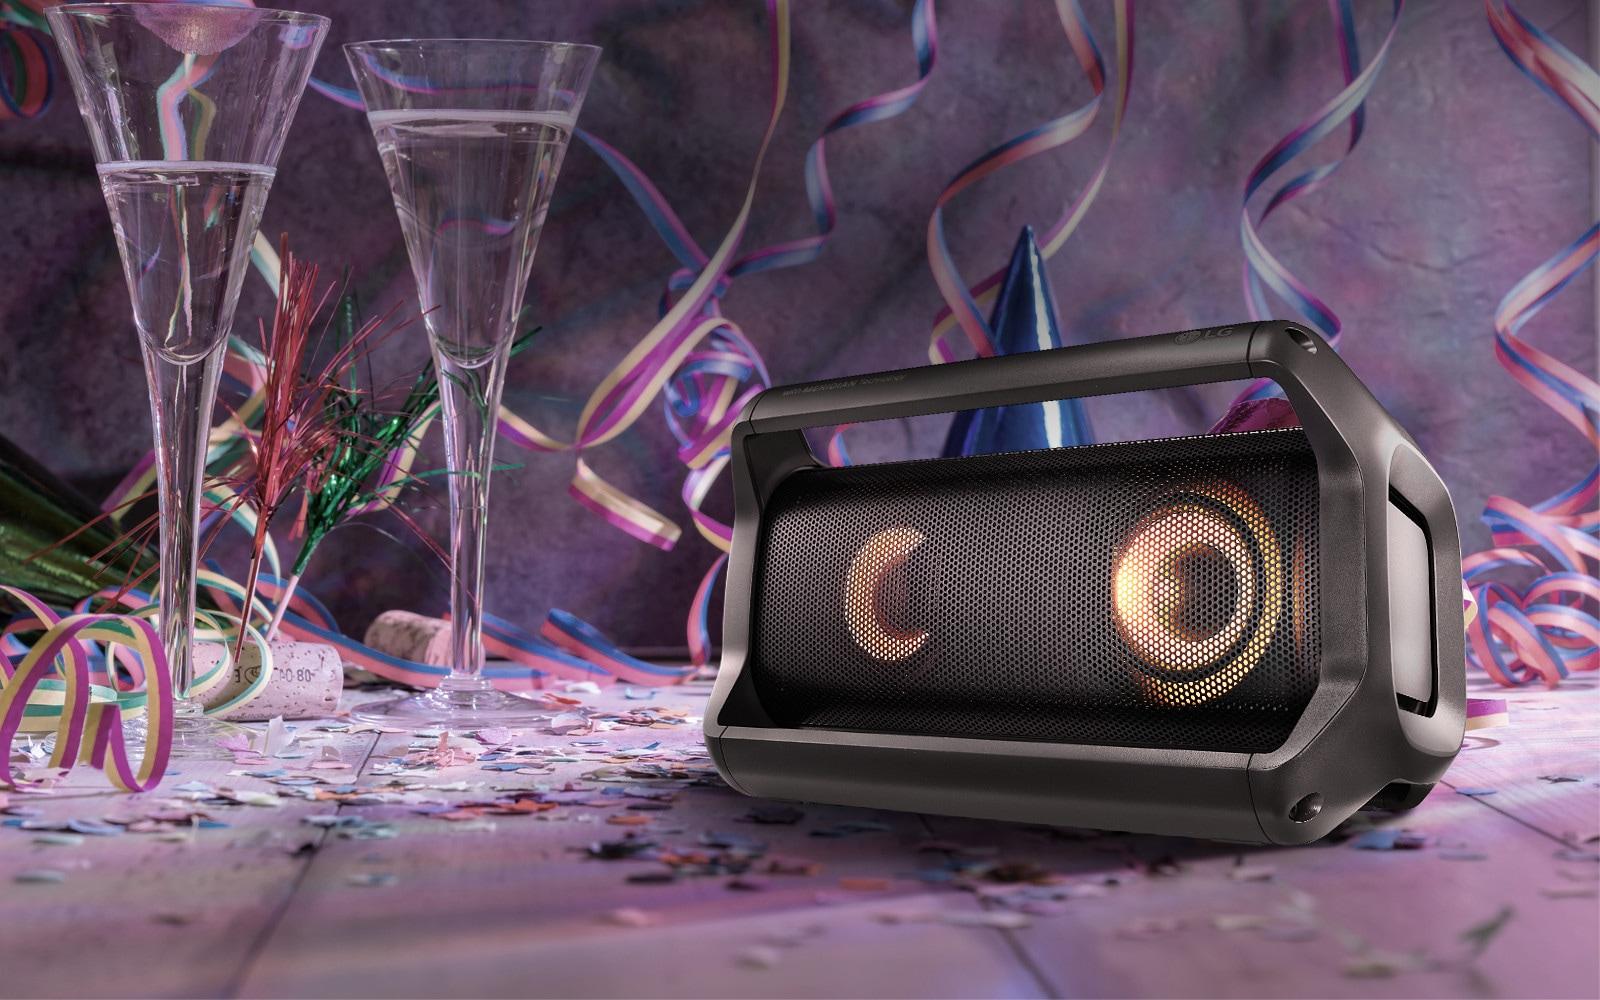 LG PK5 Enceinte portable bluetooth - Test & Avis - Les Meilleures Enceintes Avis.fr